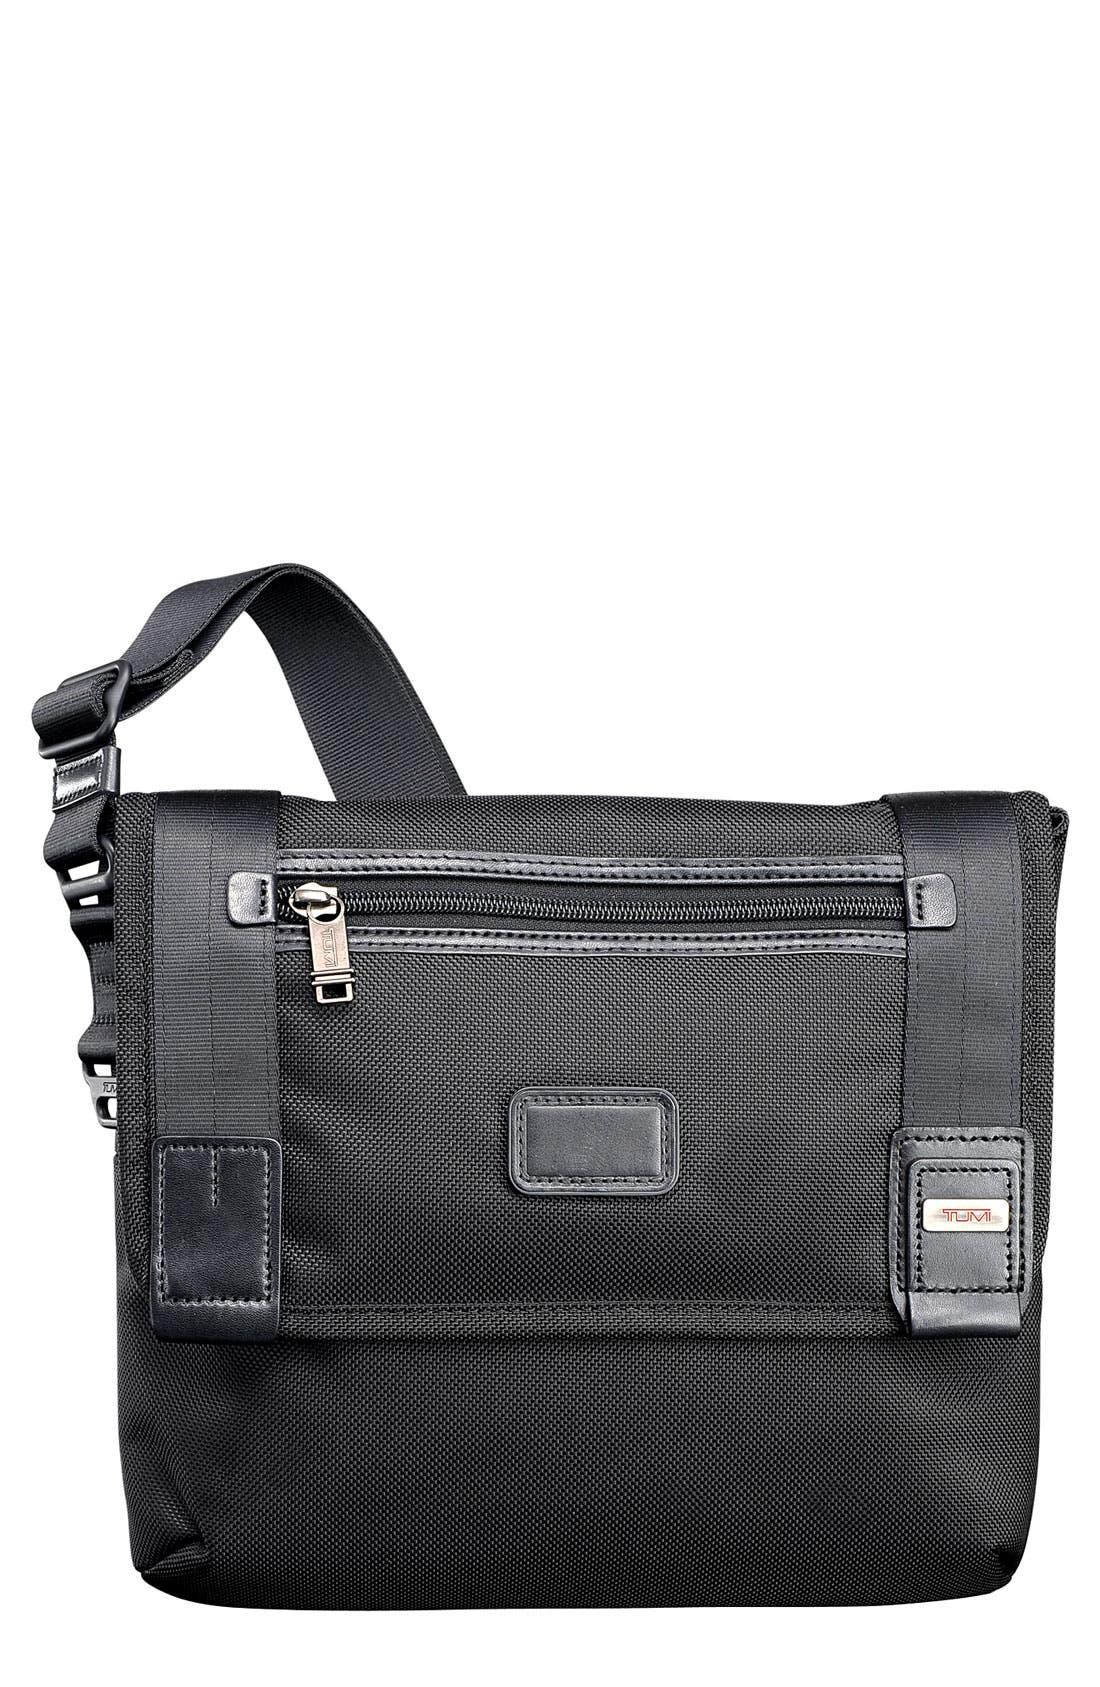 Alternate Image 1 Selected - Tumi 'Alpha Bravo - Beale Mini' Messenger Bag